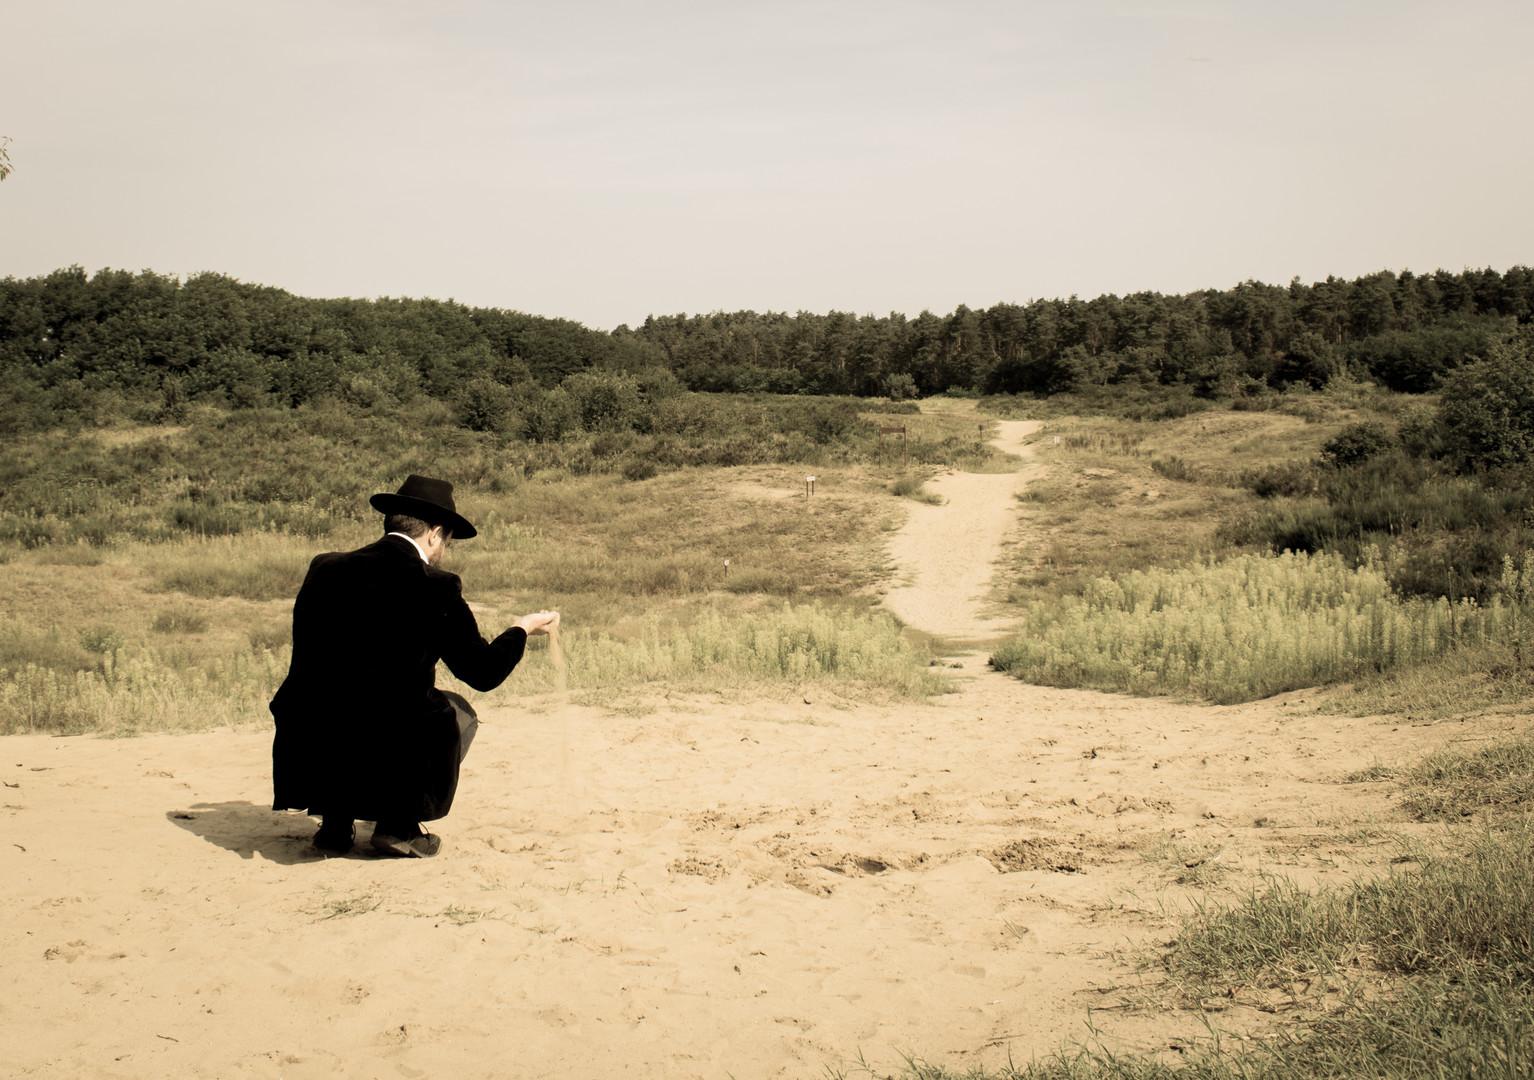 Path of regret